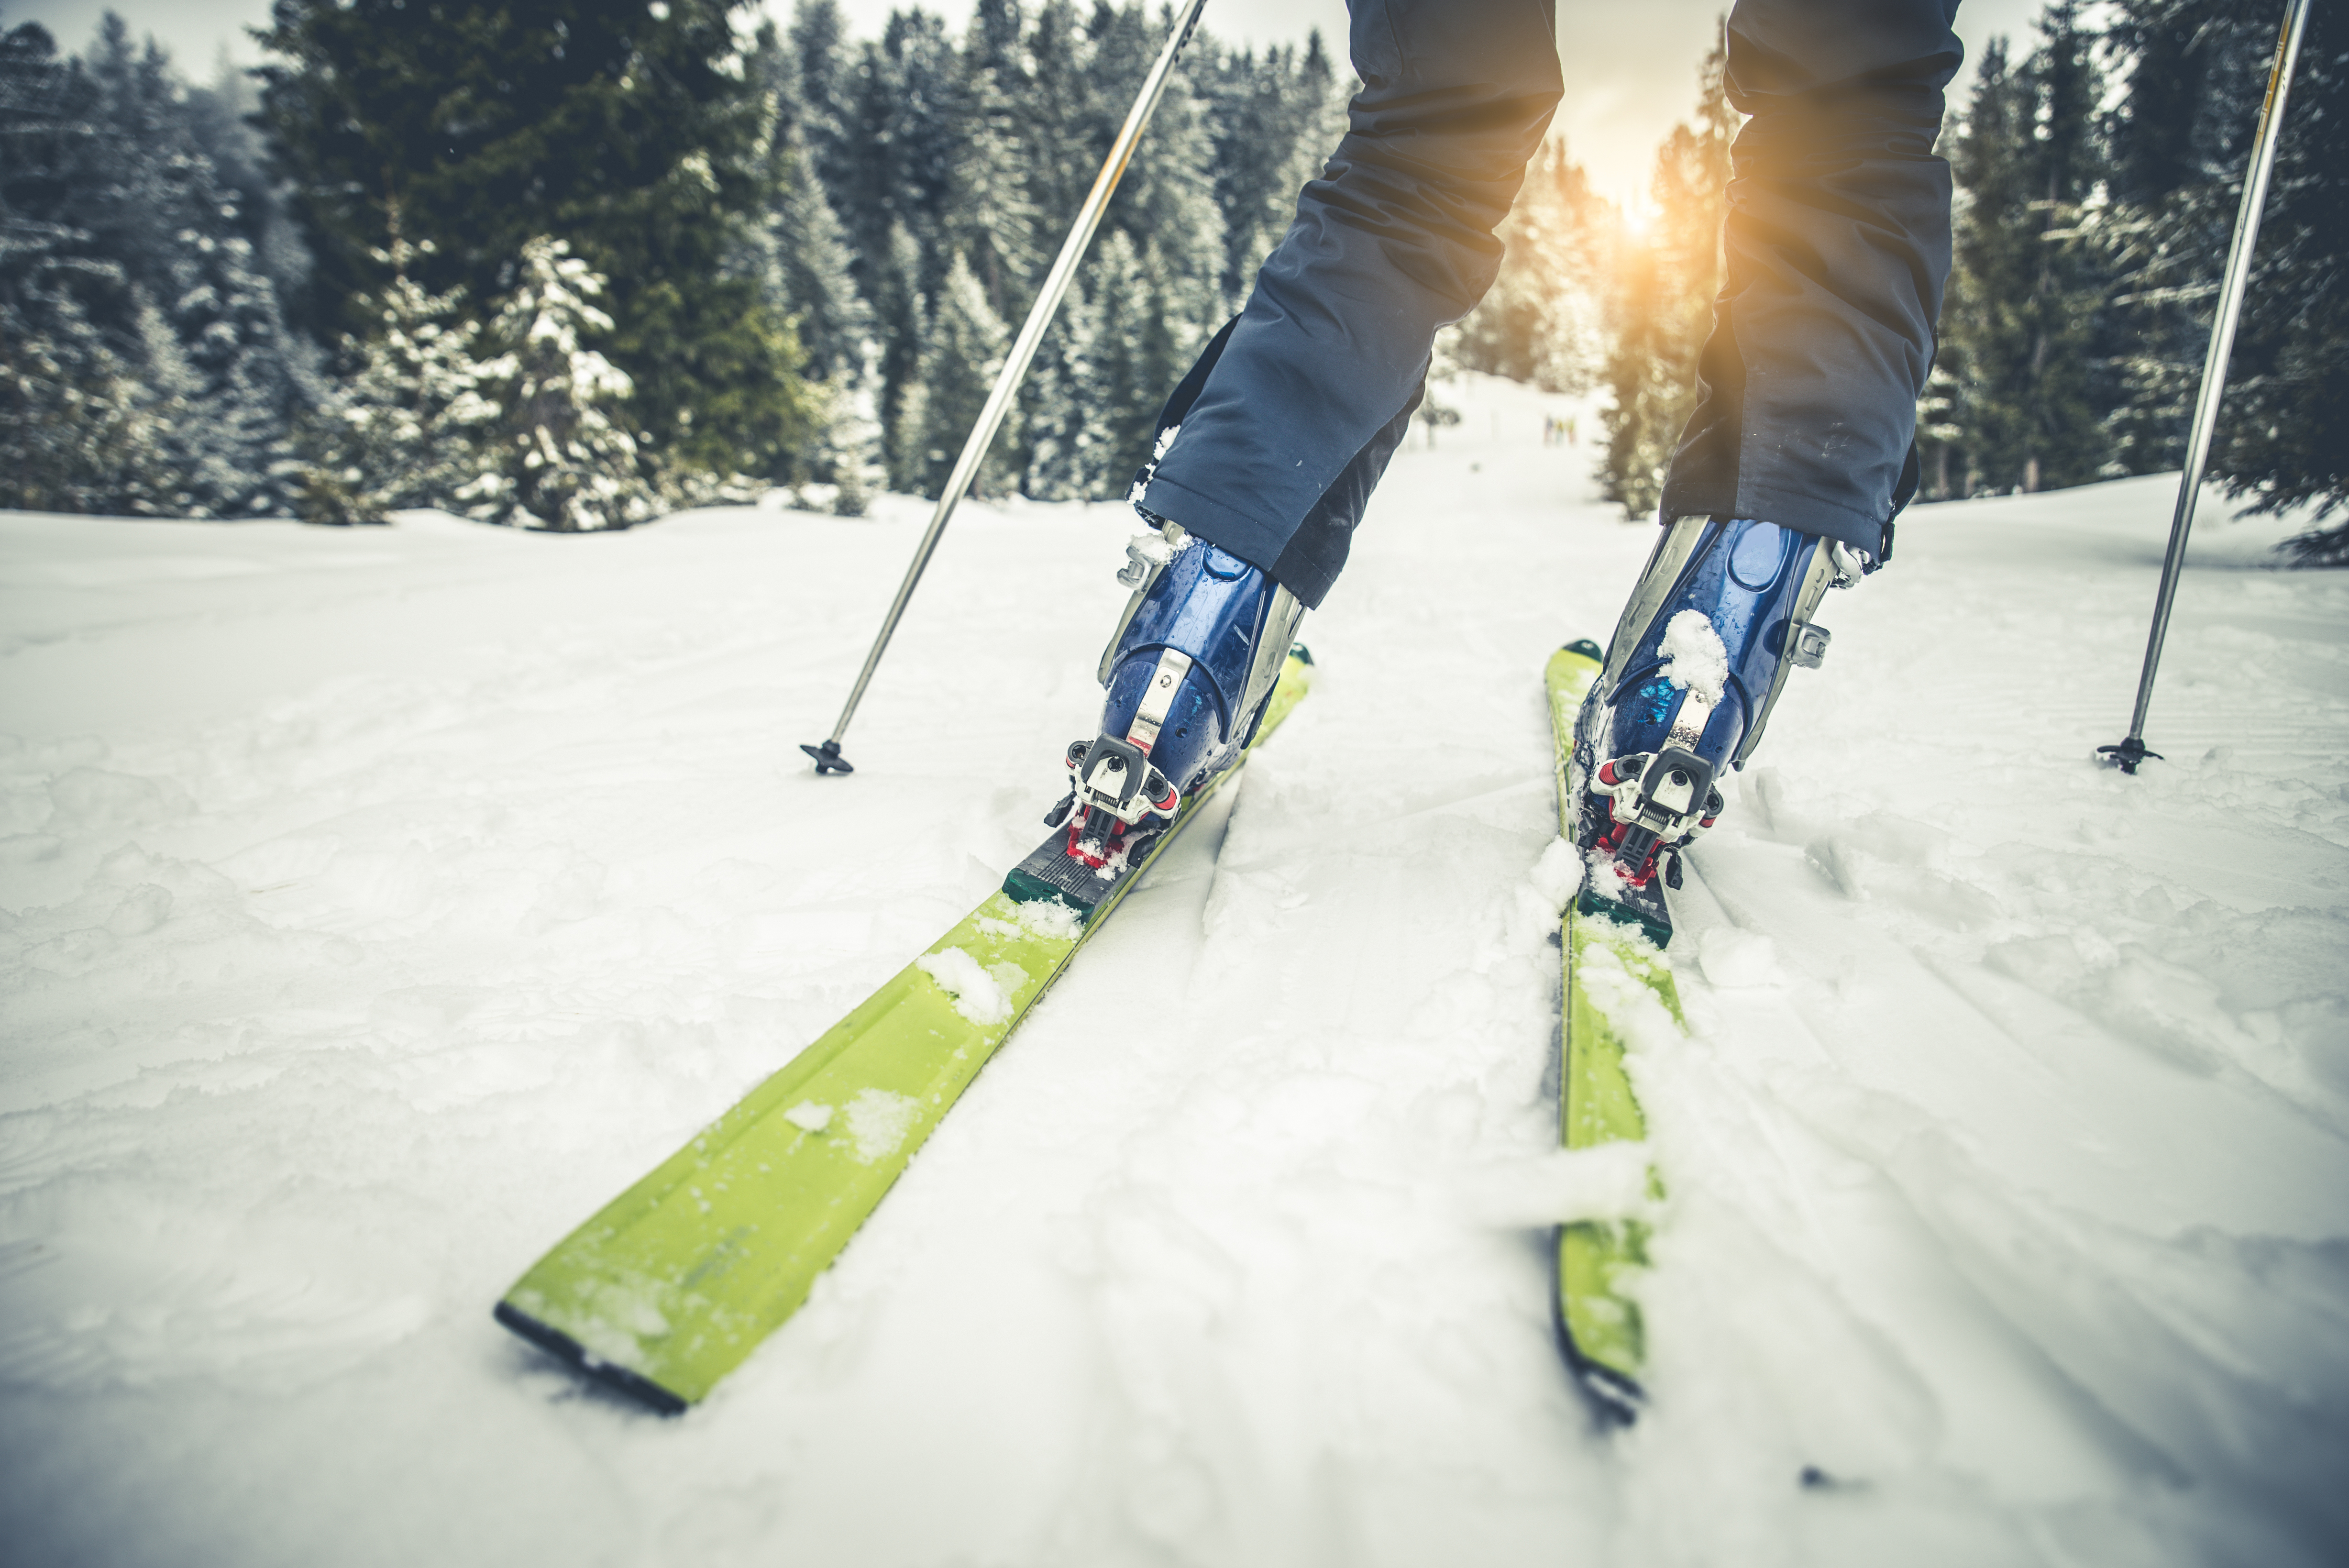 what is idaho's best ski resort? | usa today